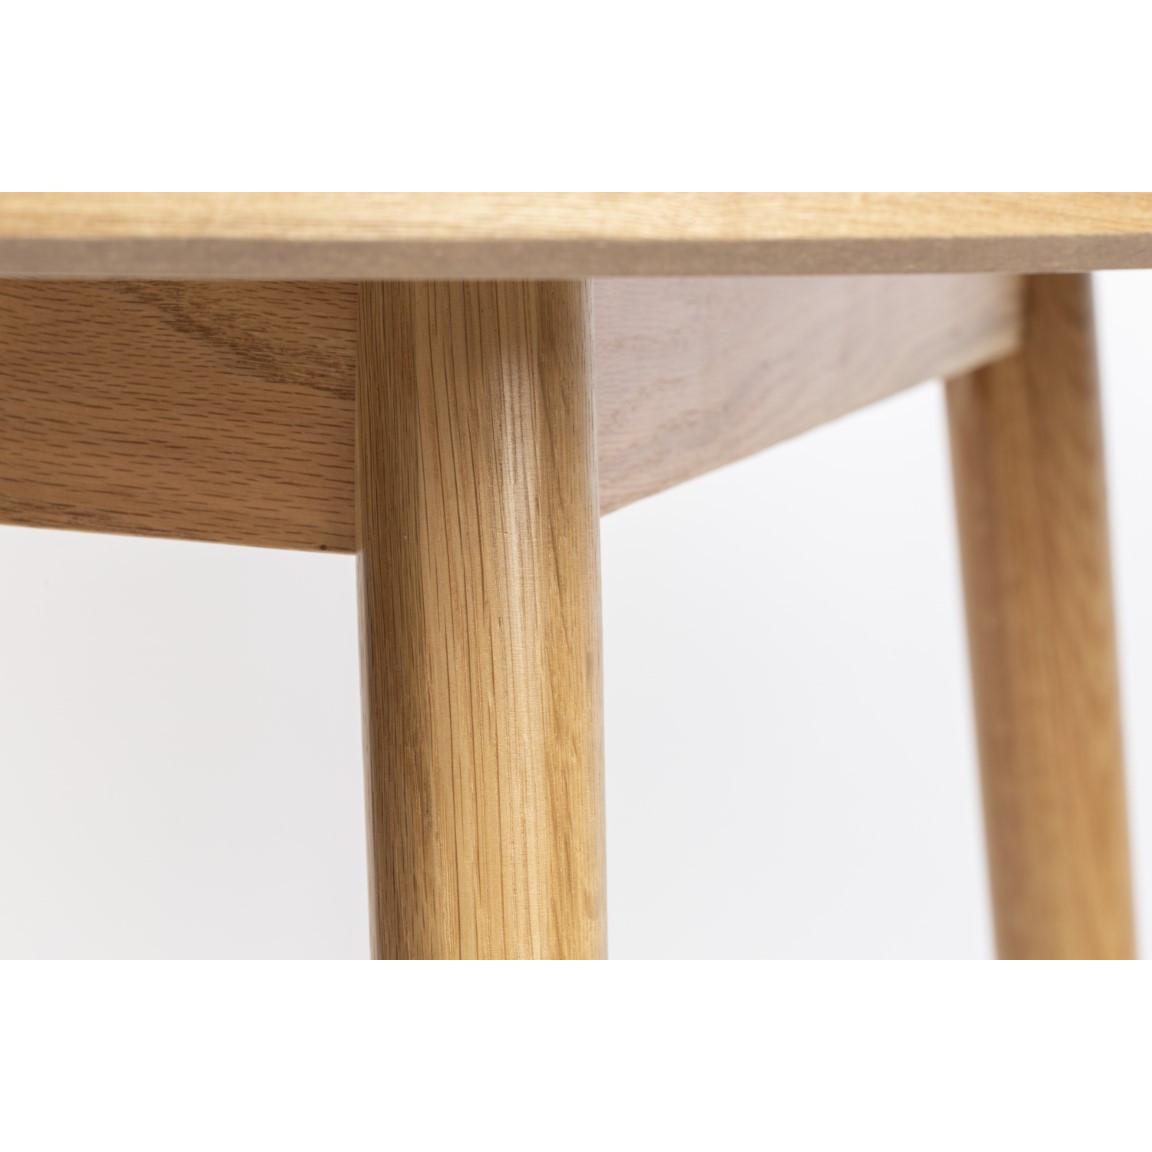 Tisch Fabio | Helles Holz